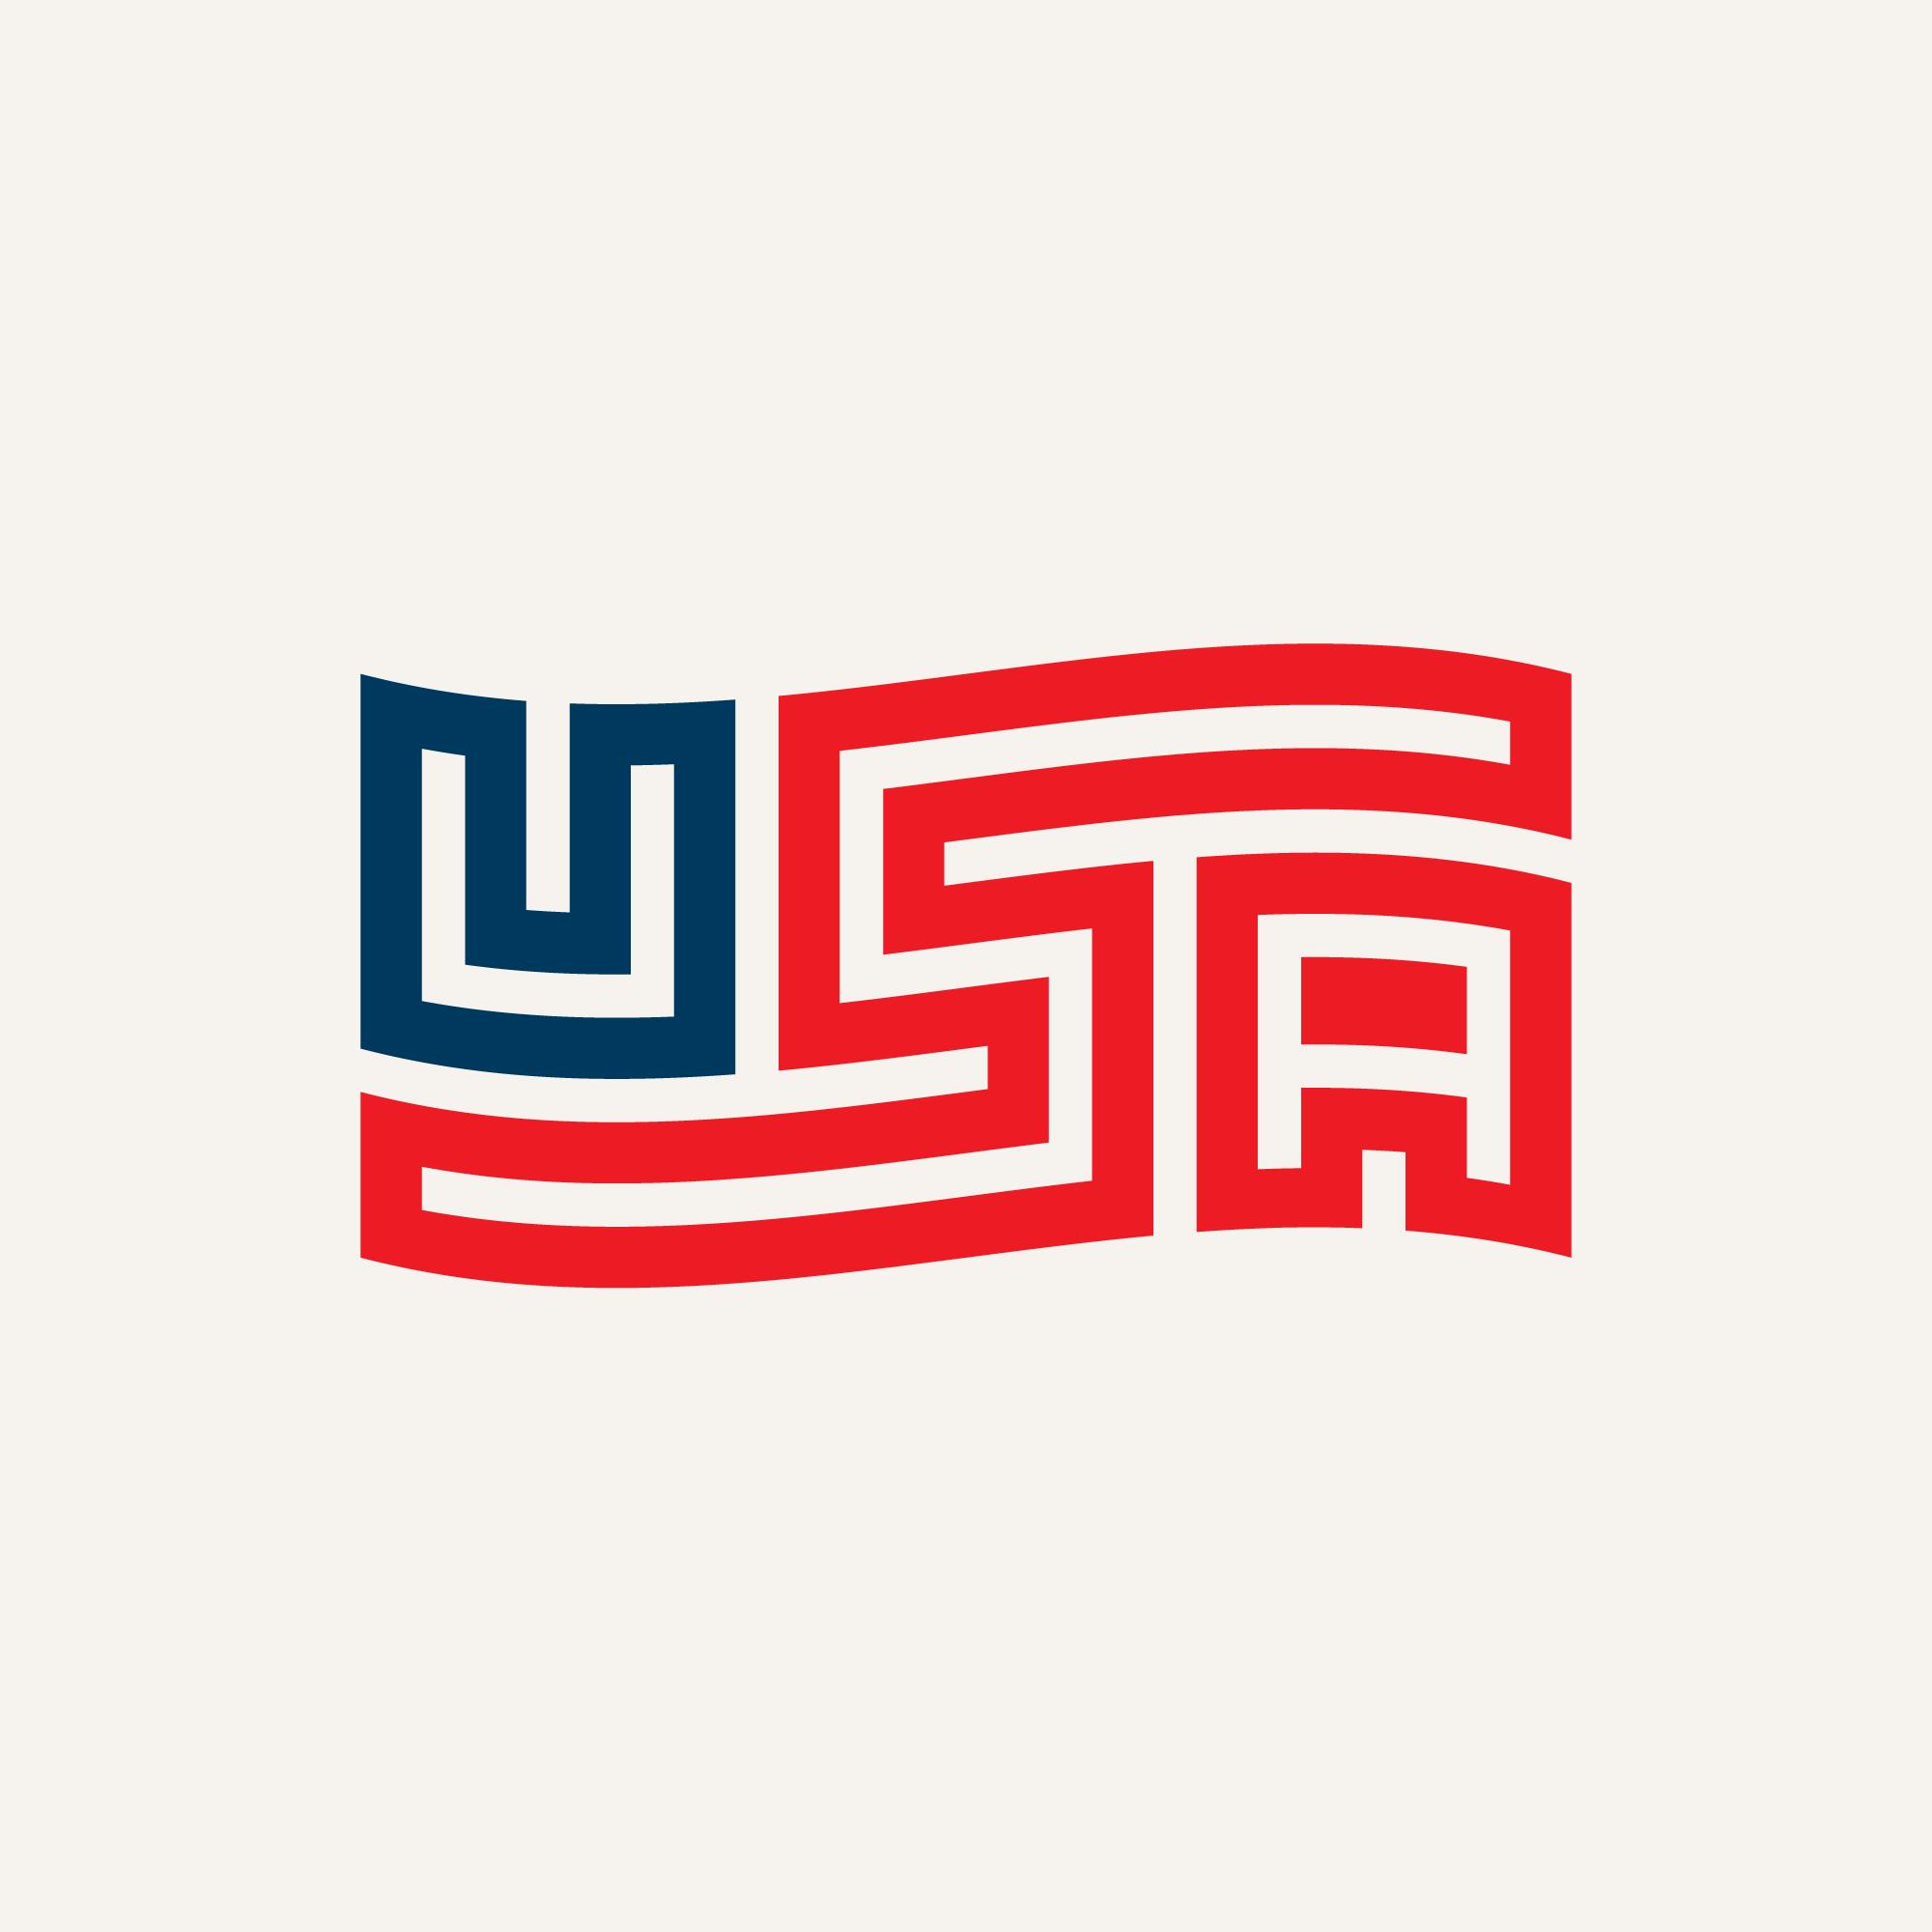 Logos_Second40-44.png